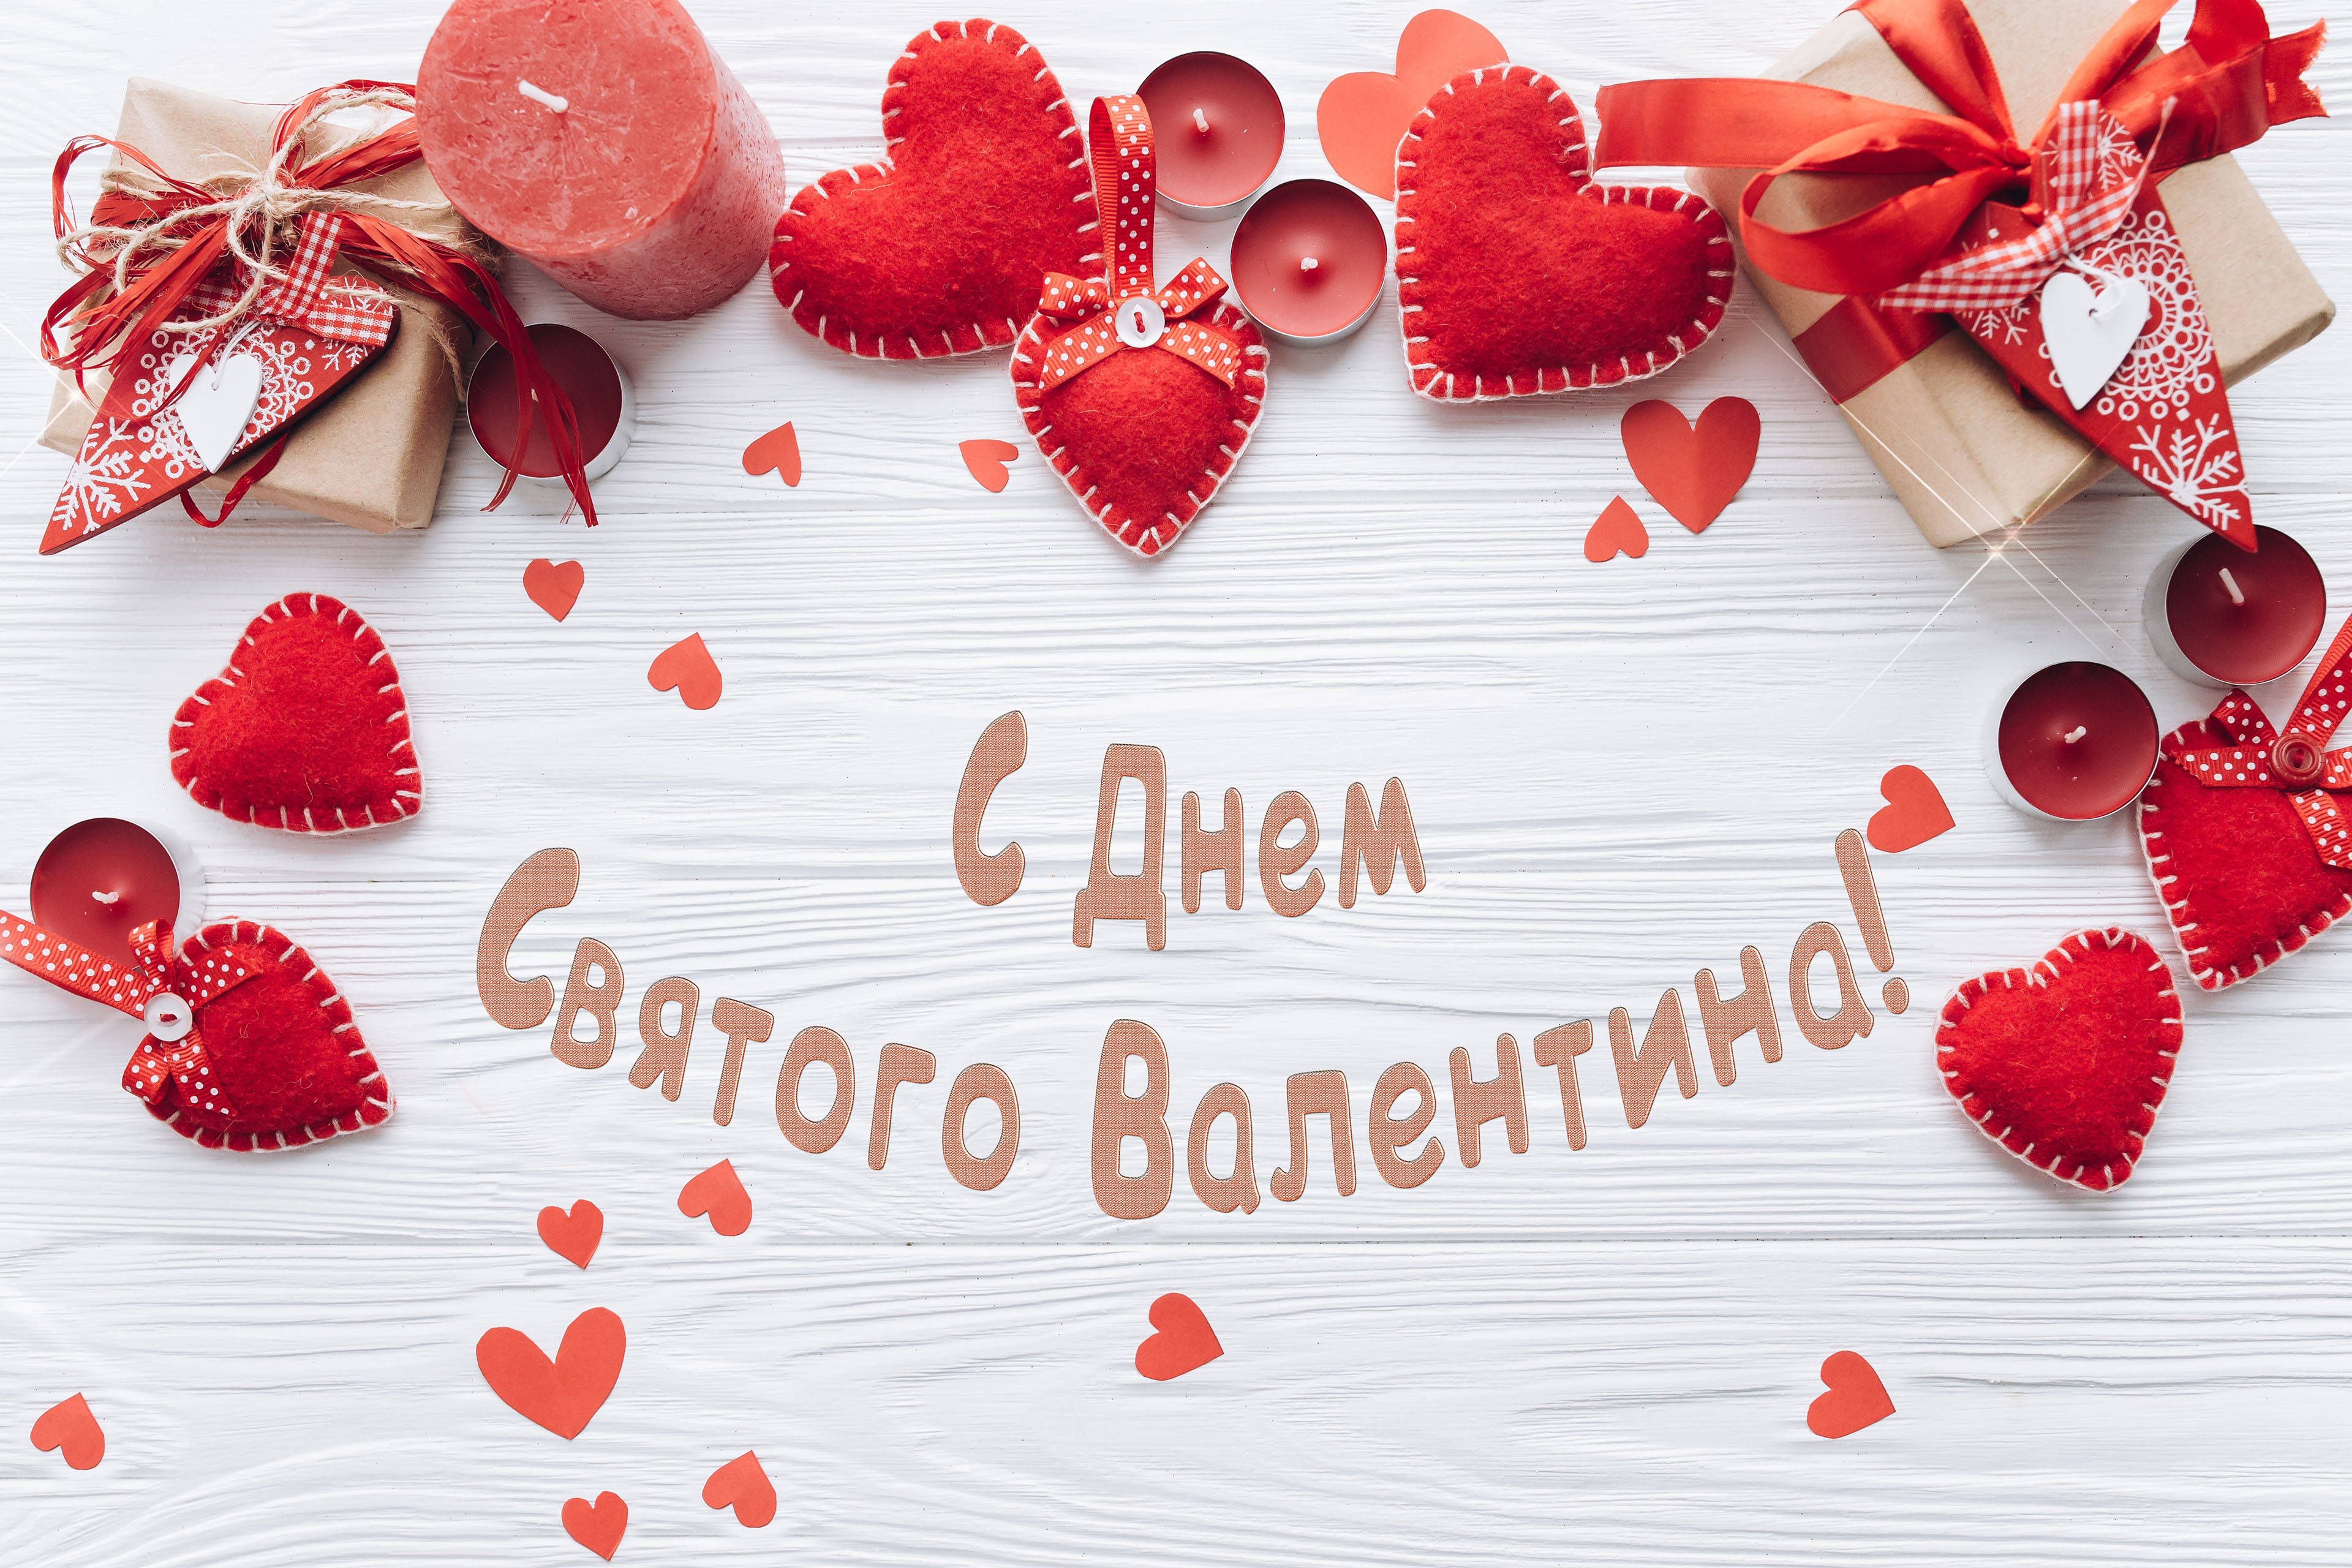 HDoboi.Kiev.ua - День влюбленных фото красивое